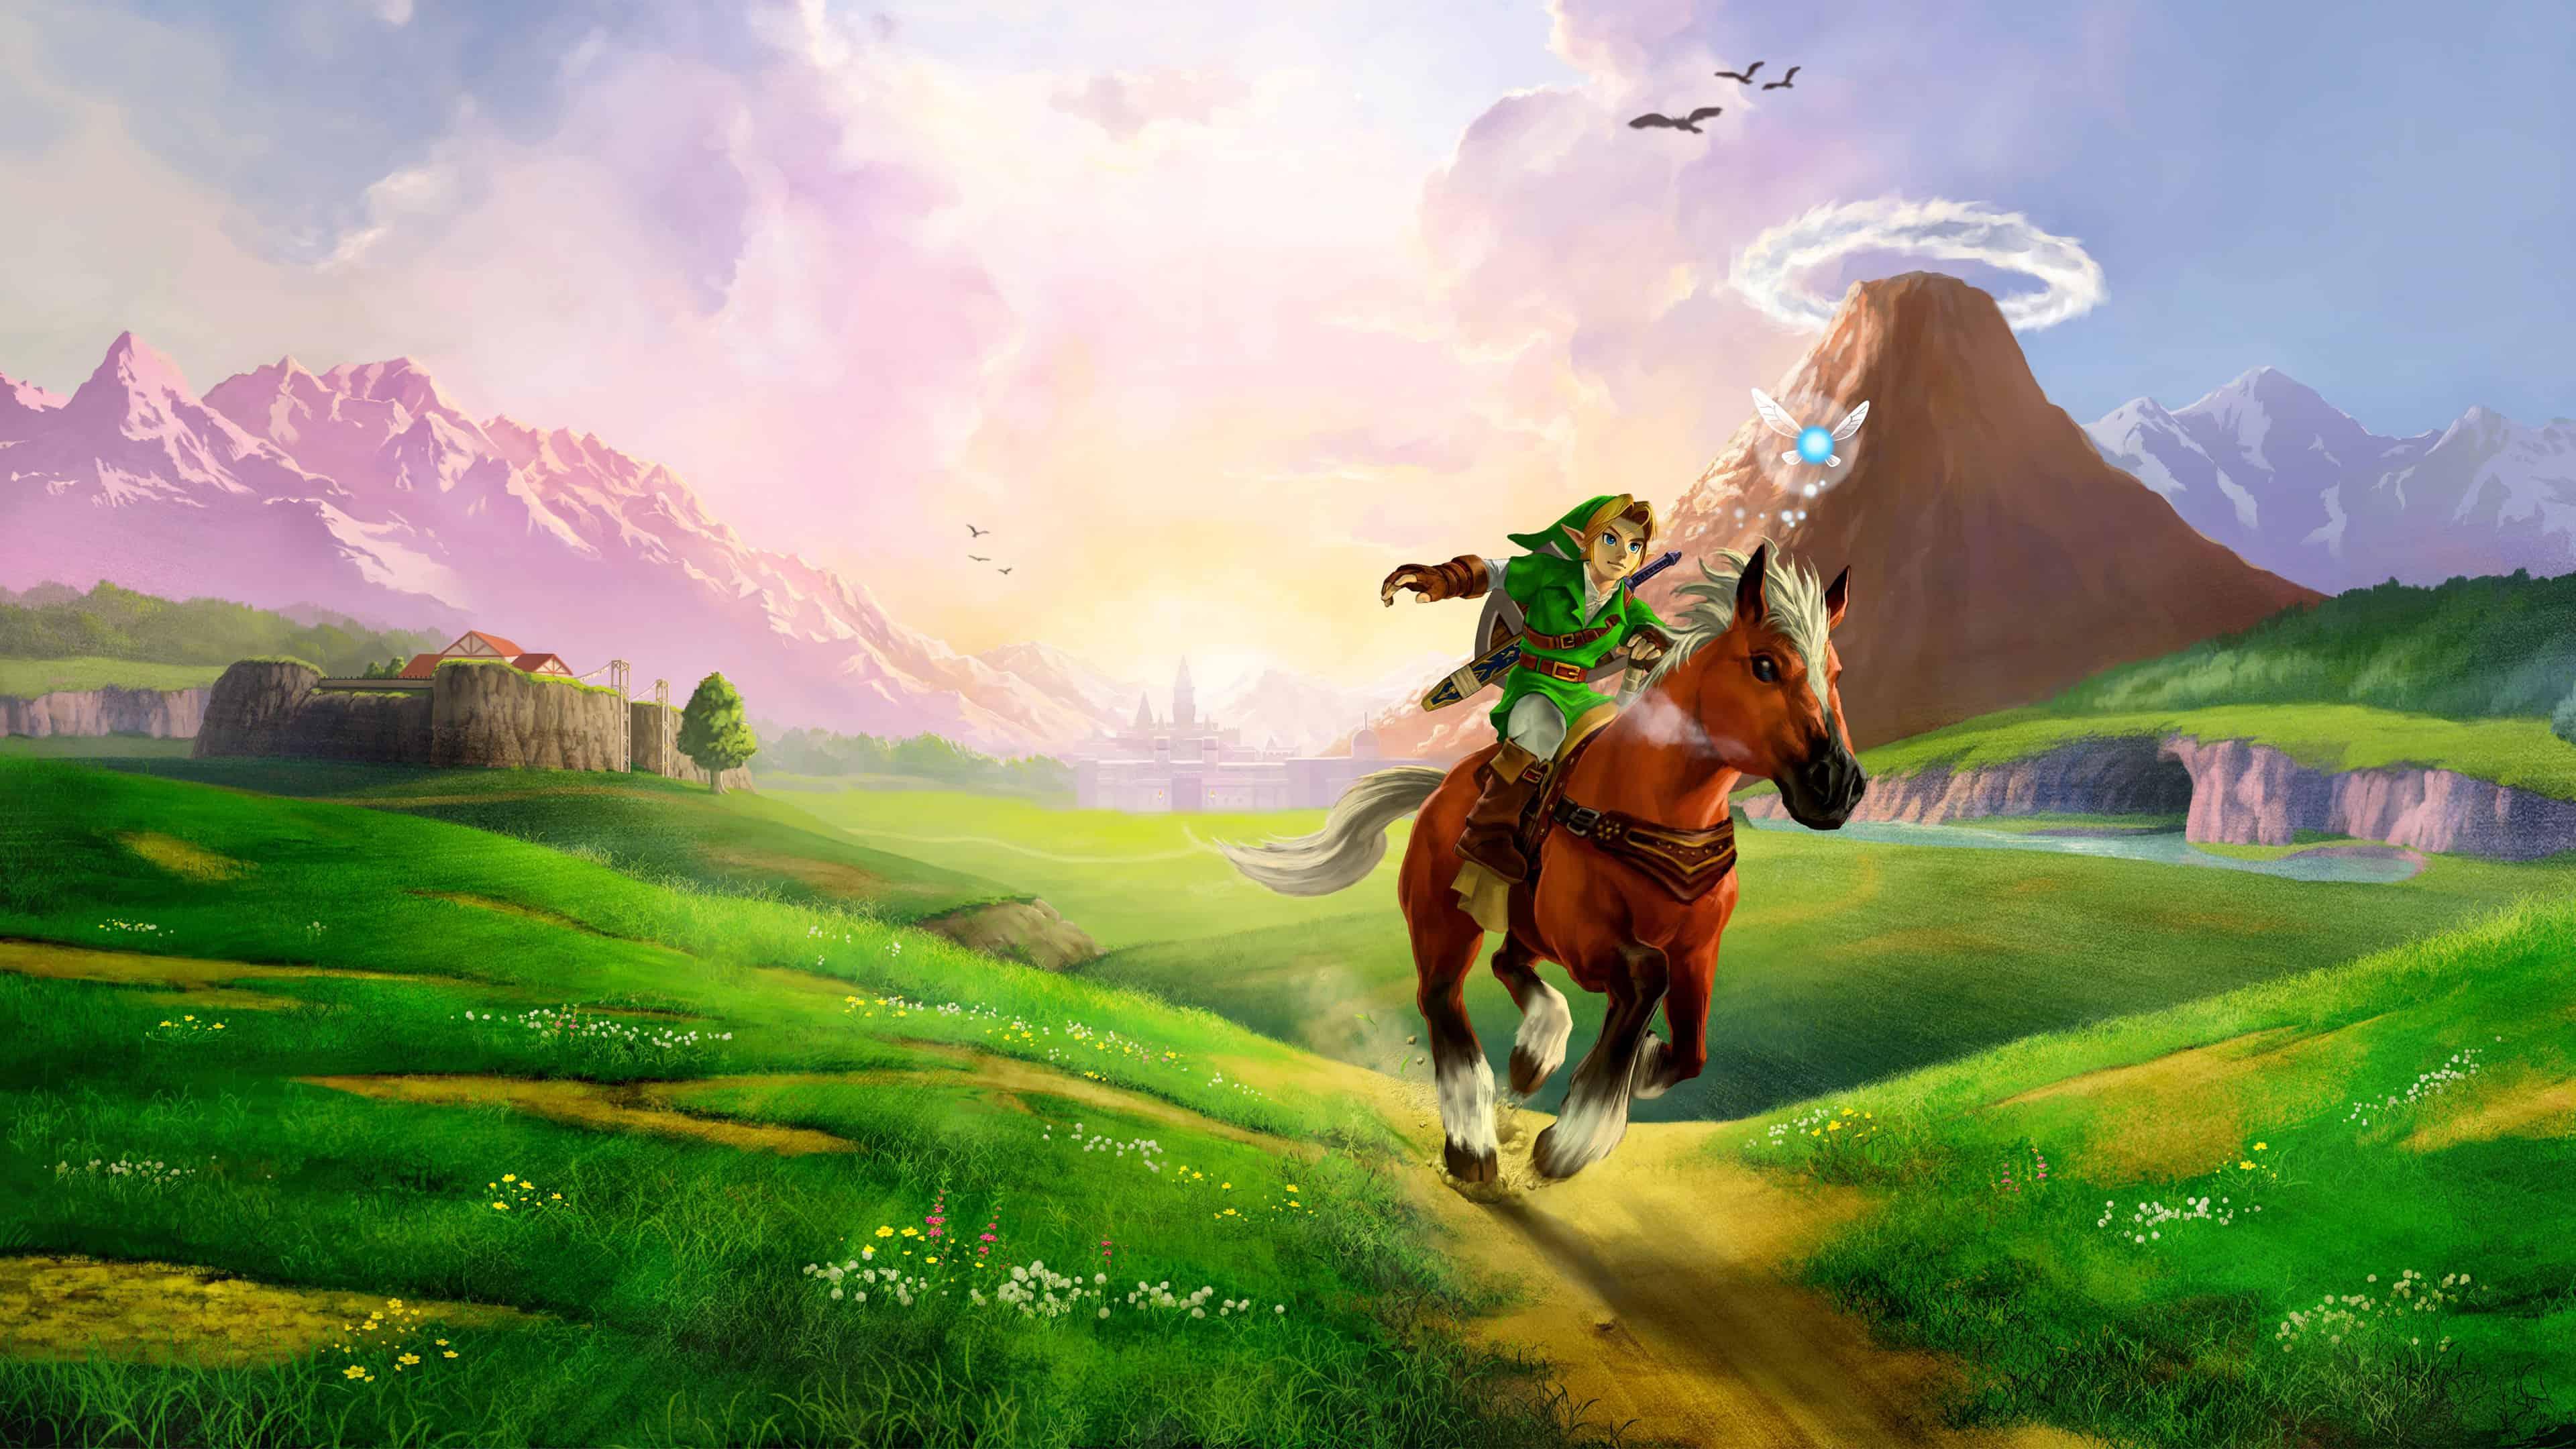 legend of zelda ocarina of time link riding horse uhd 4k wallpaper